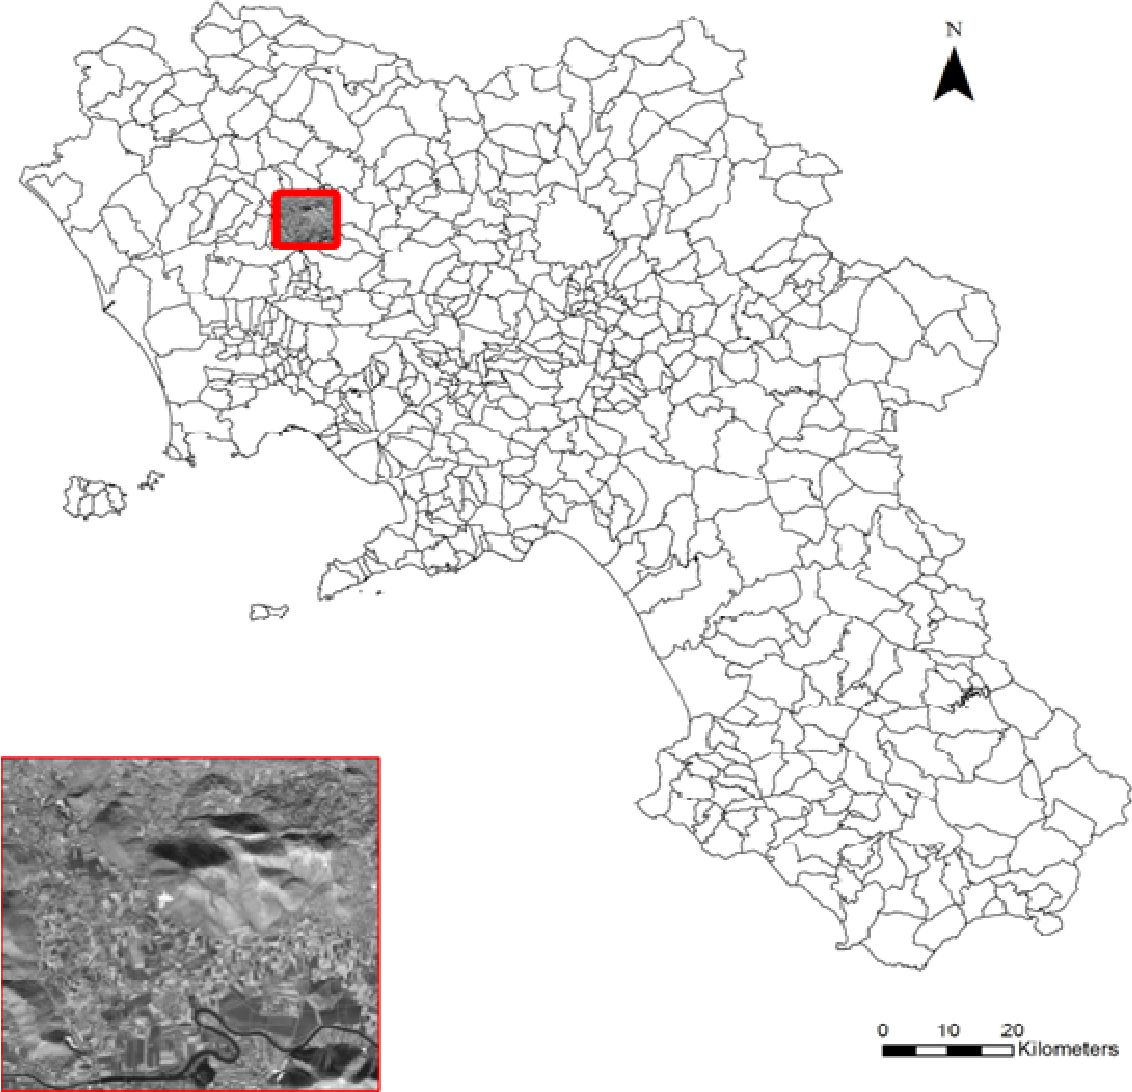 PDF] Comparison of Methods for IKONOS Images Pan-sharpening